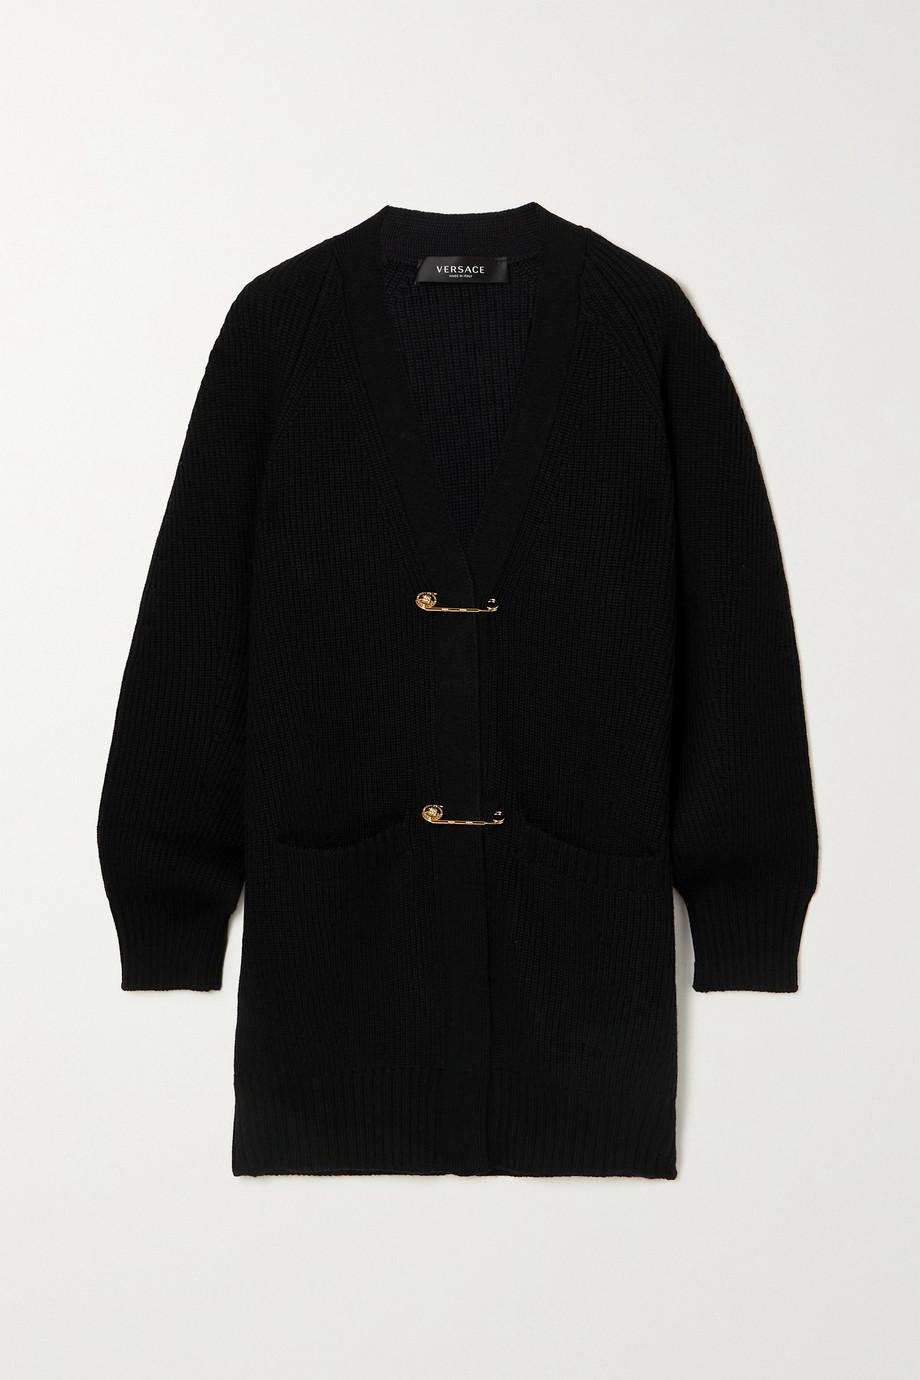 Versace Embellished ribbed wool cardigan